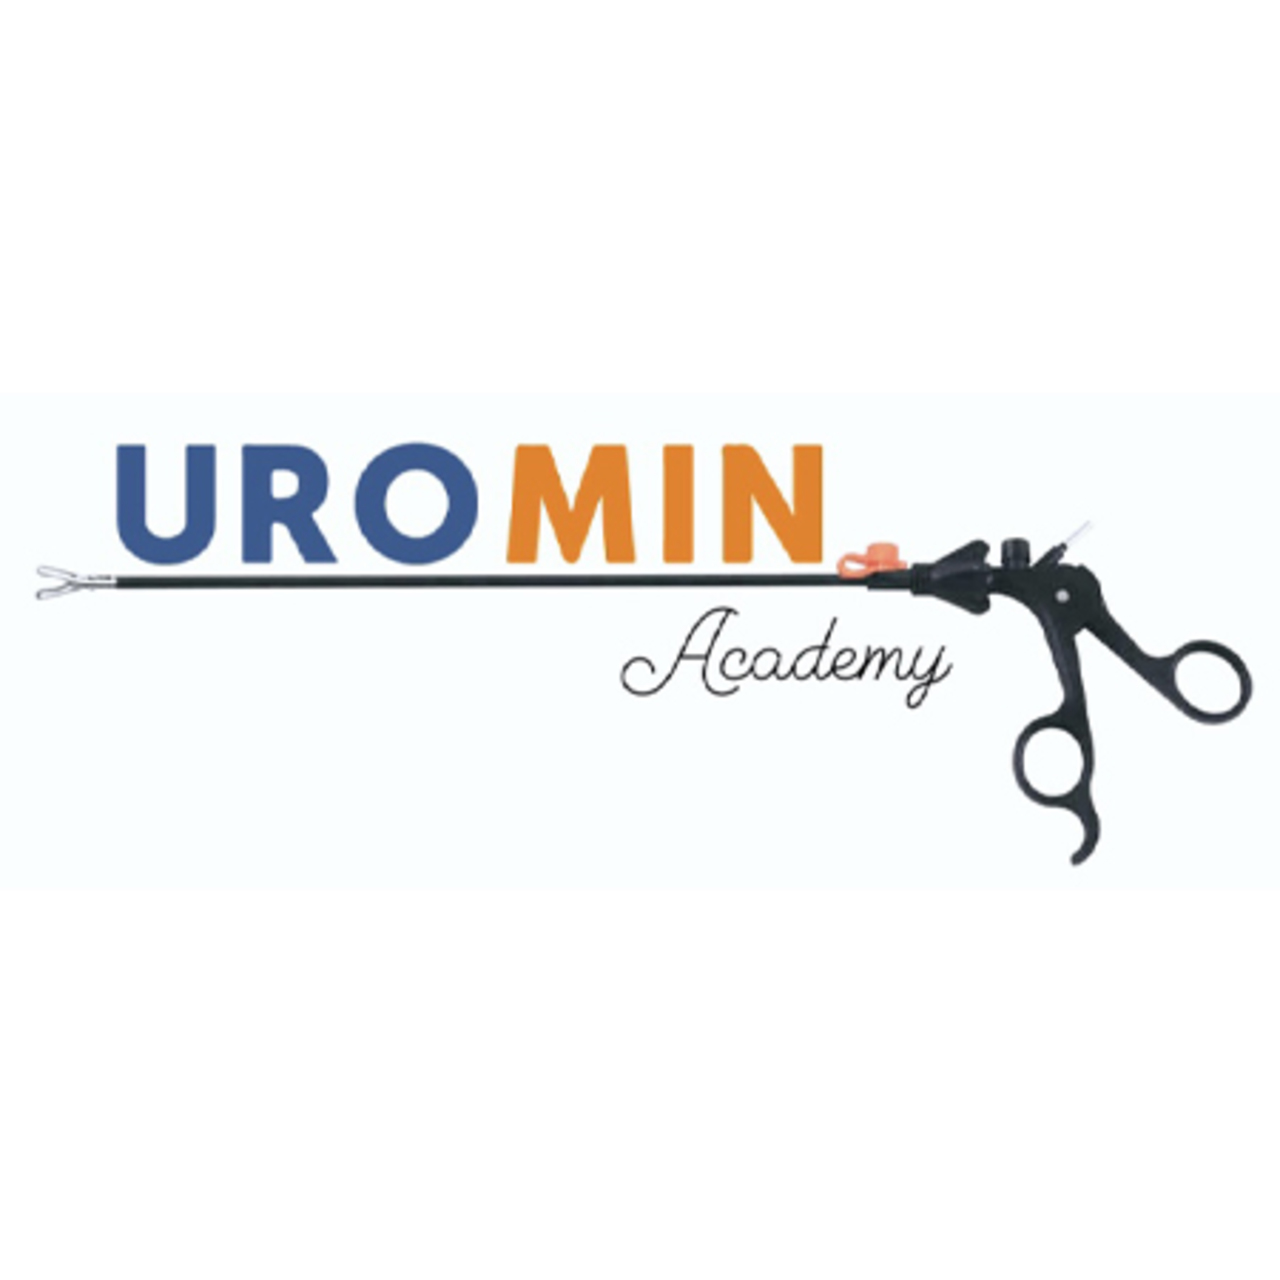 Uromin Academy